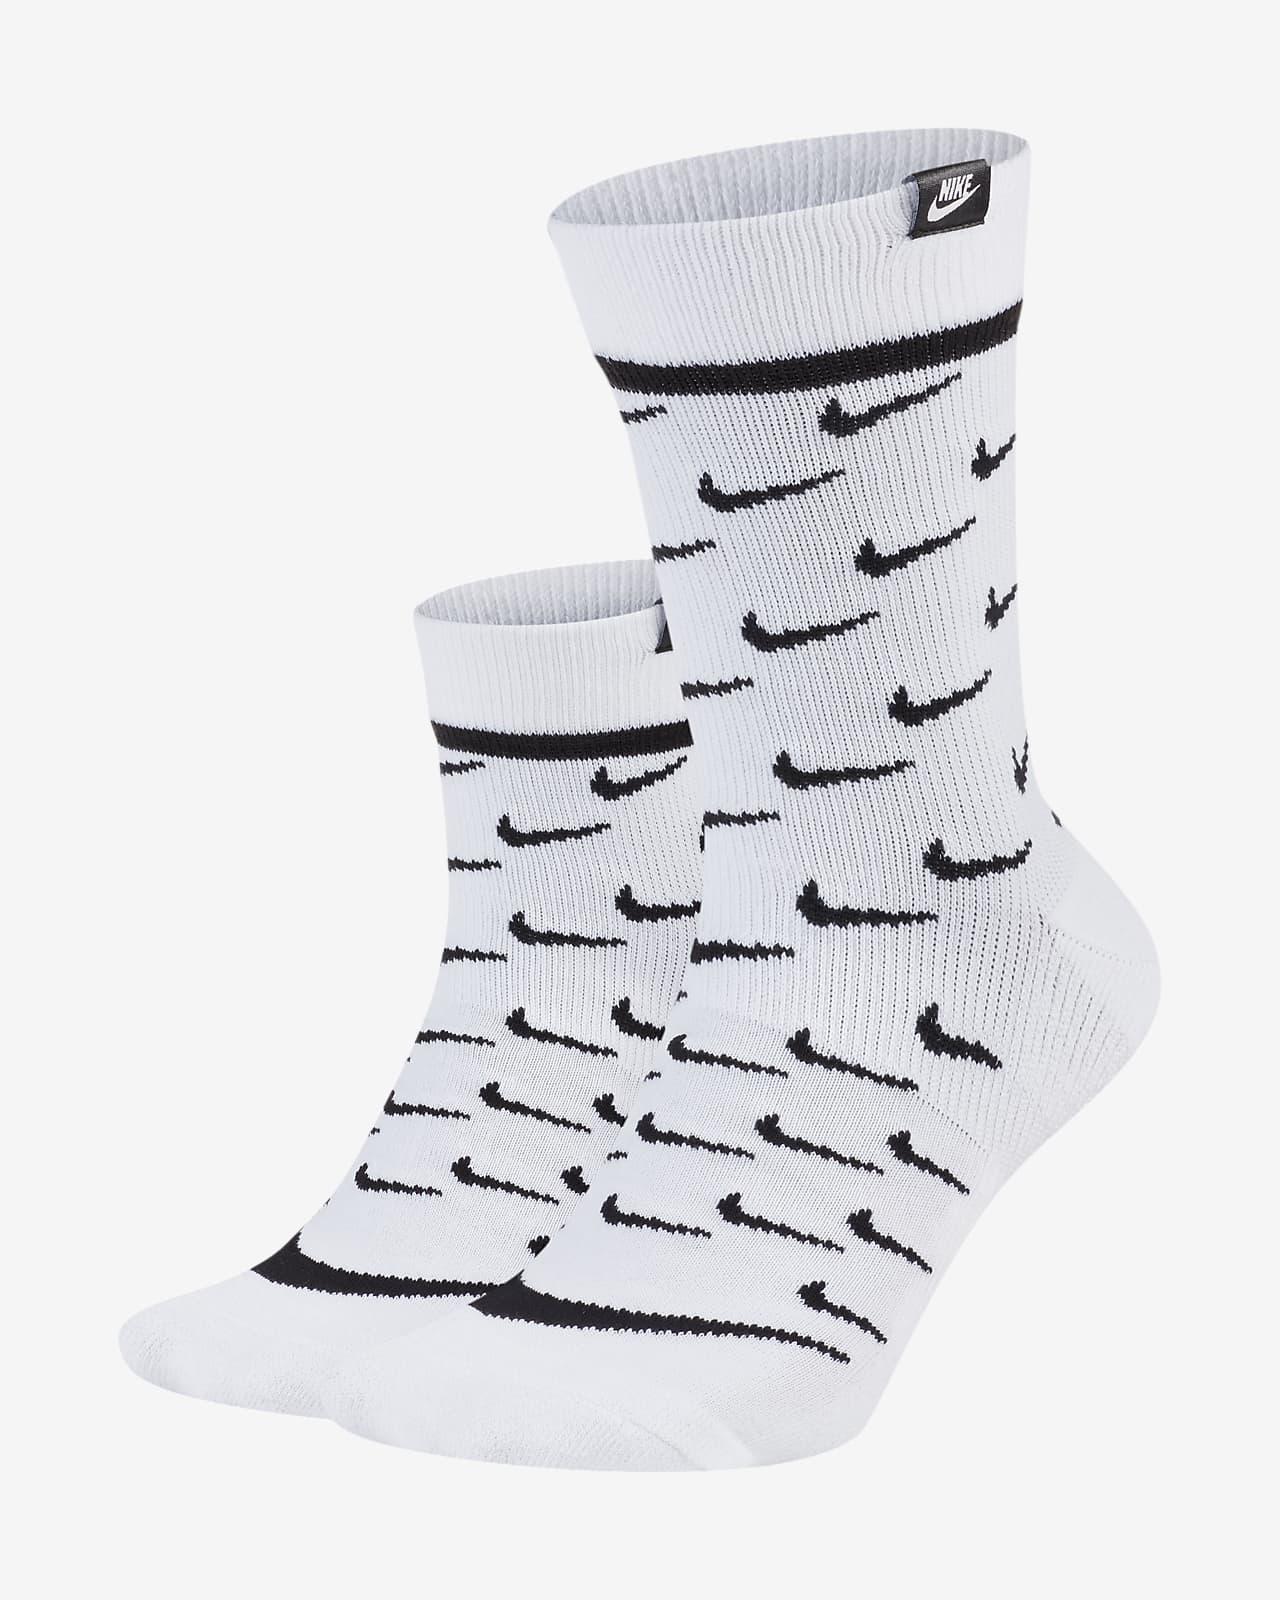 Nike Sportswear SNKR Sox Crew Socks (2 Pairs)